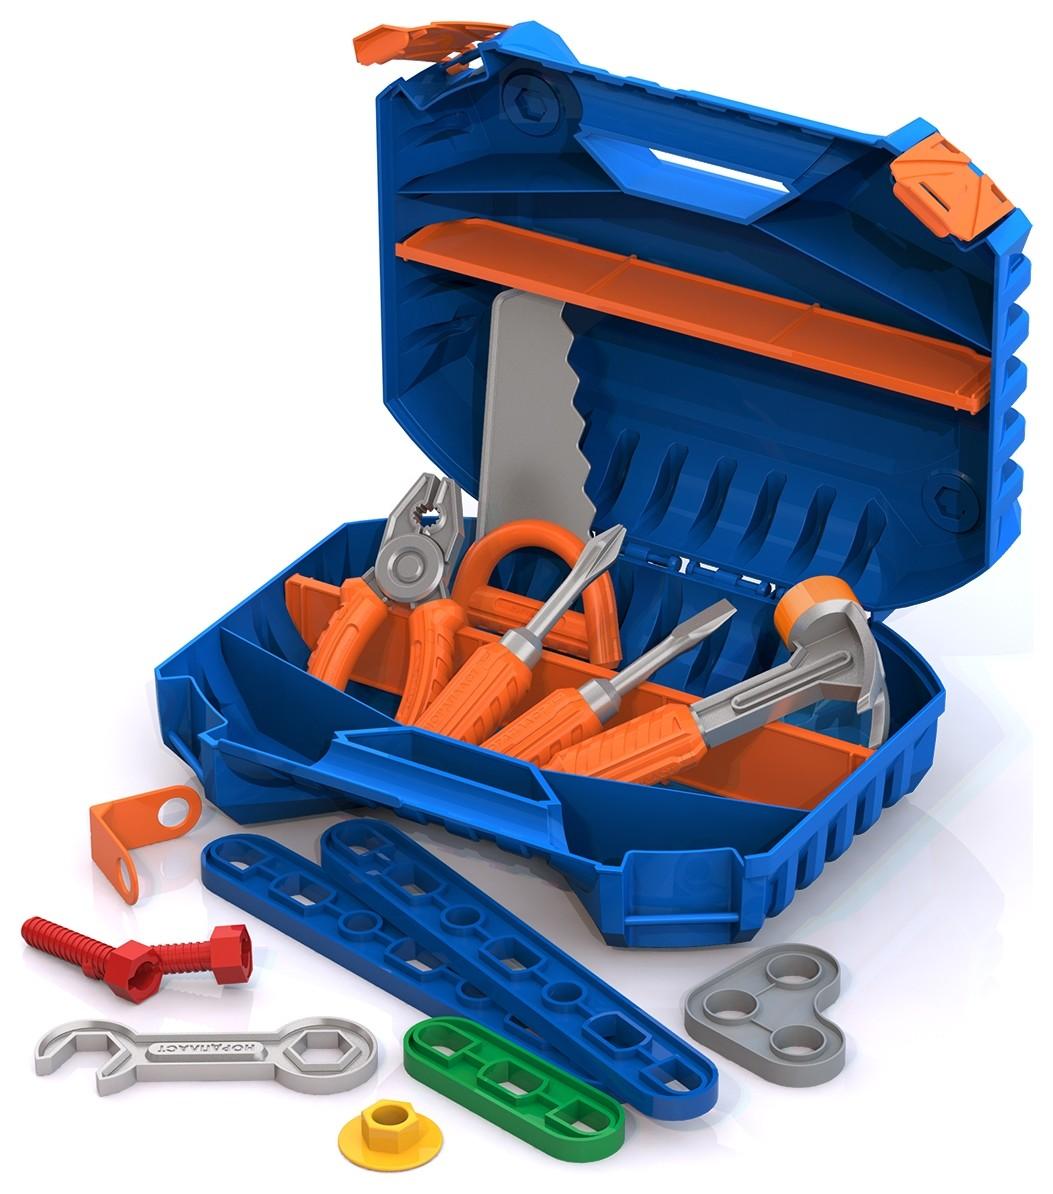 Набор инструментов с конструктором  Нордпласт